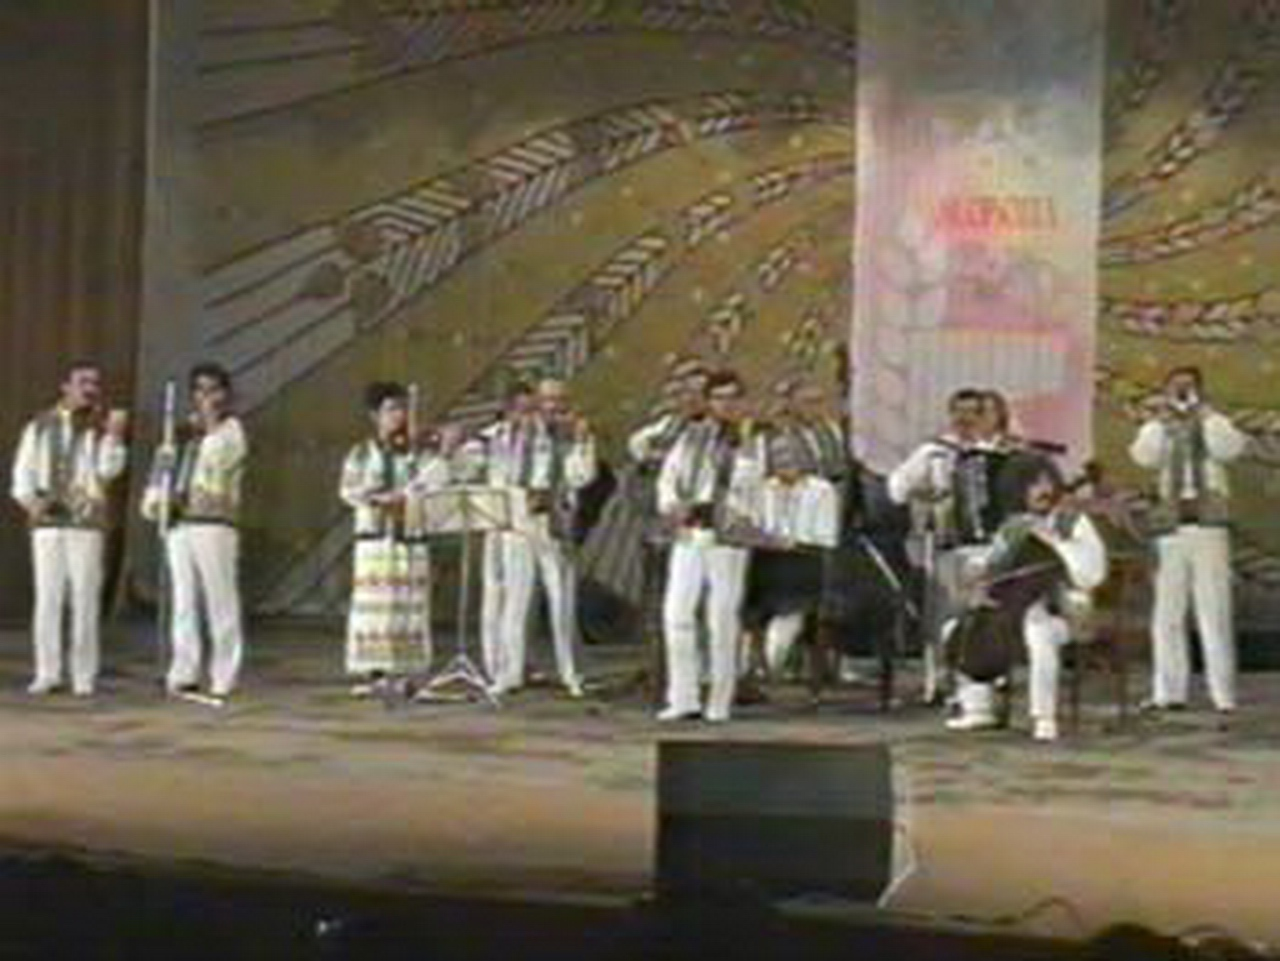 1995 - Ansamblul \'\'Fluierasul\'\' - Moldova